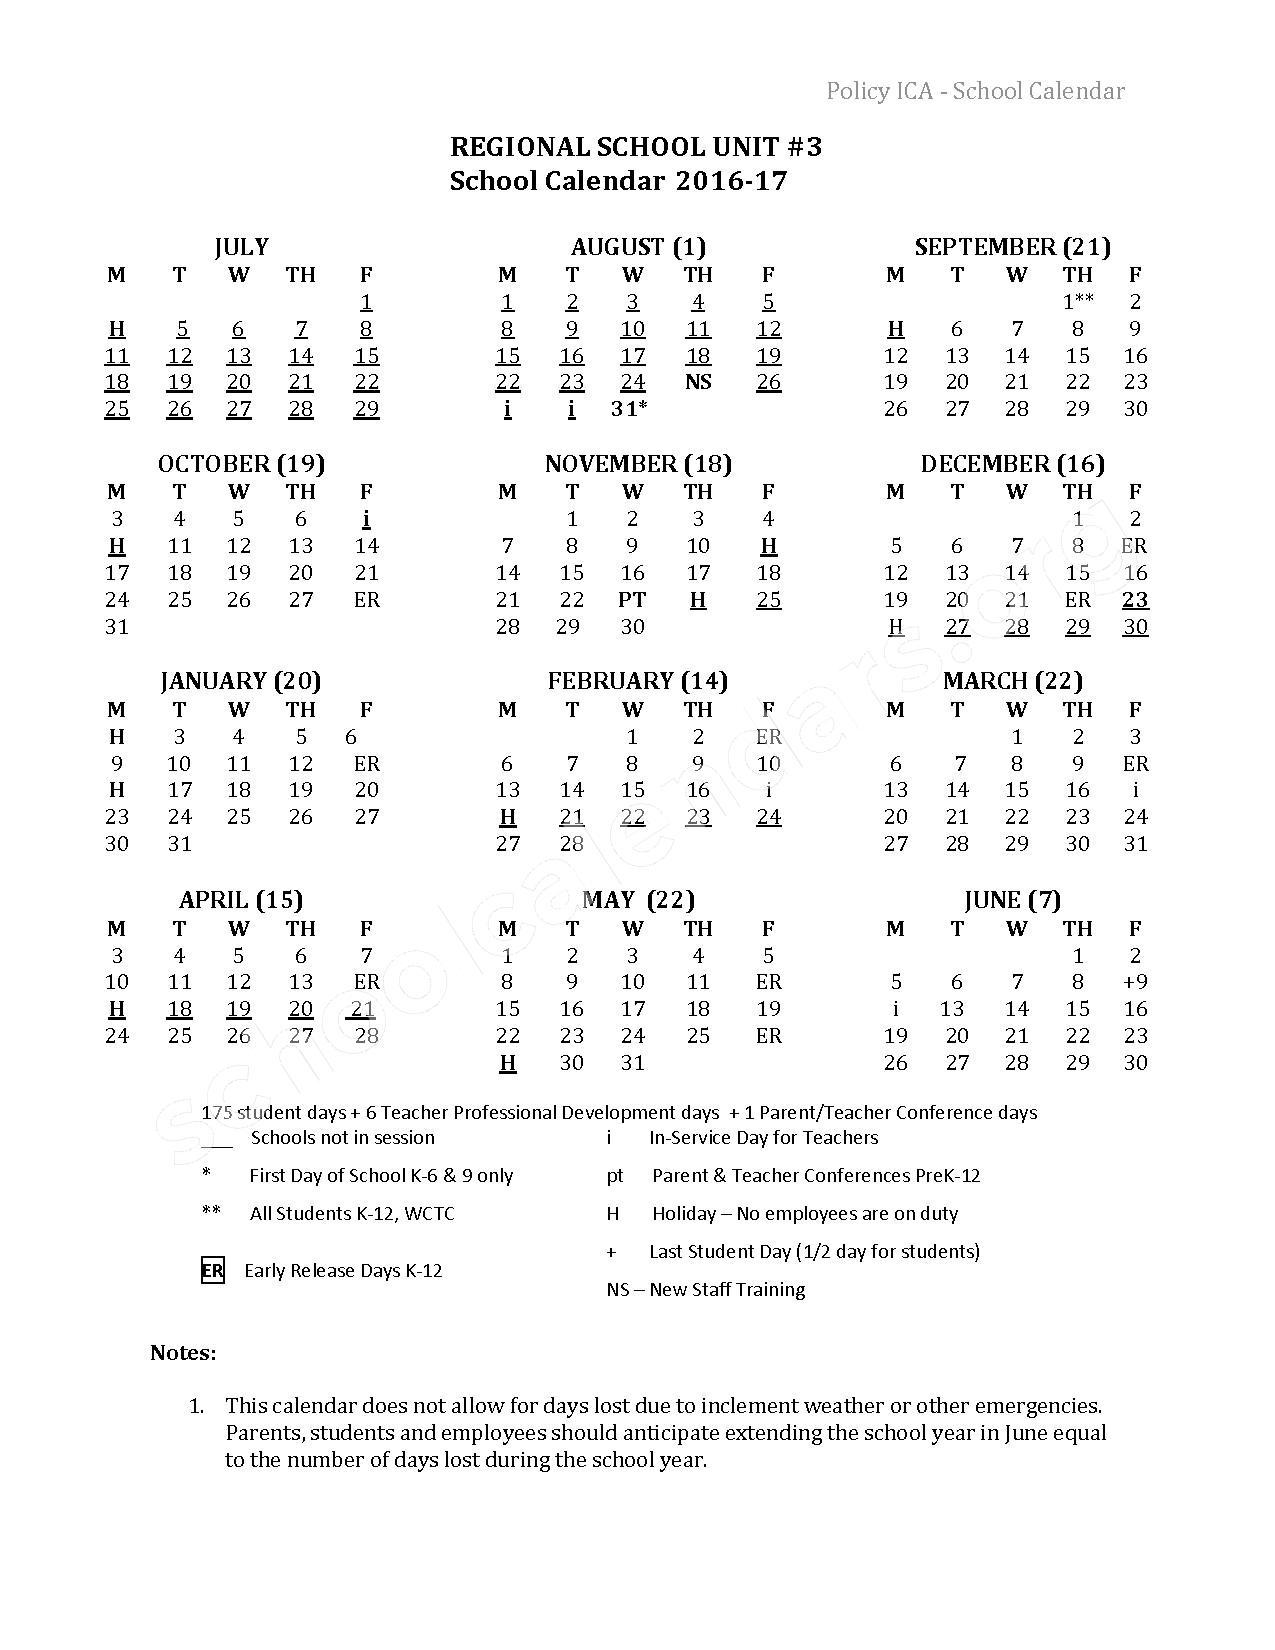 2016 - 2017 School Calendar – Mt View Elementary School – page 1